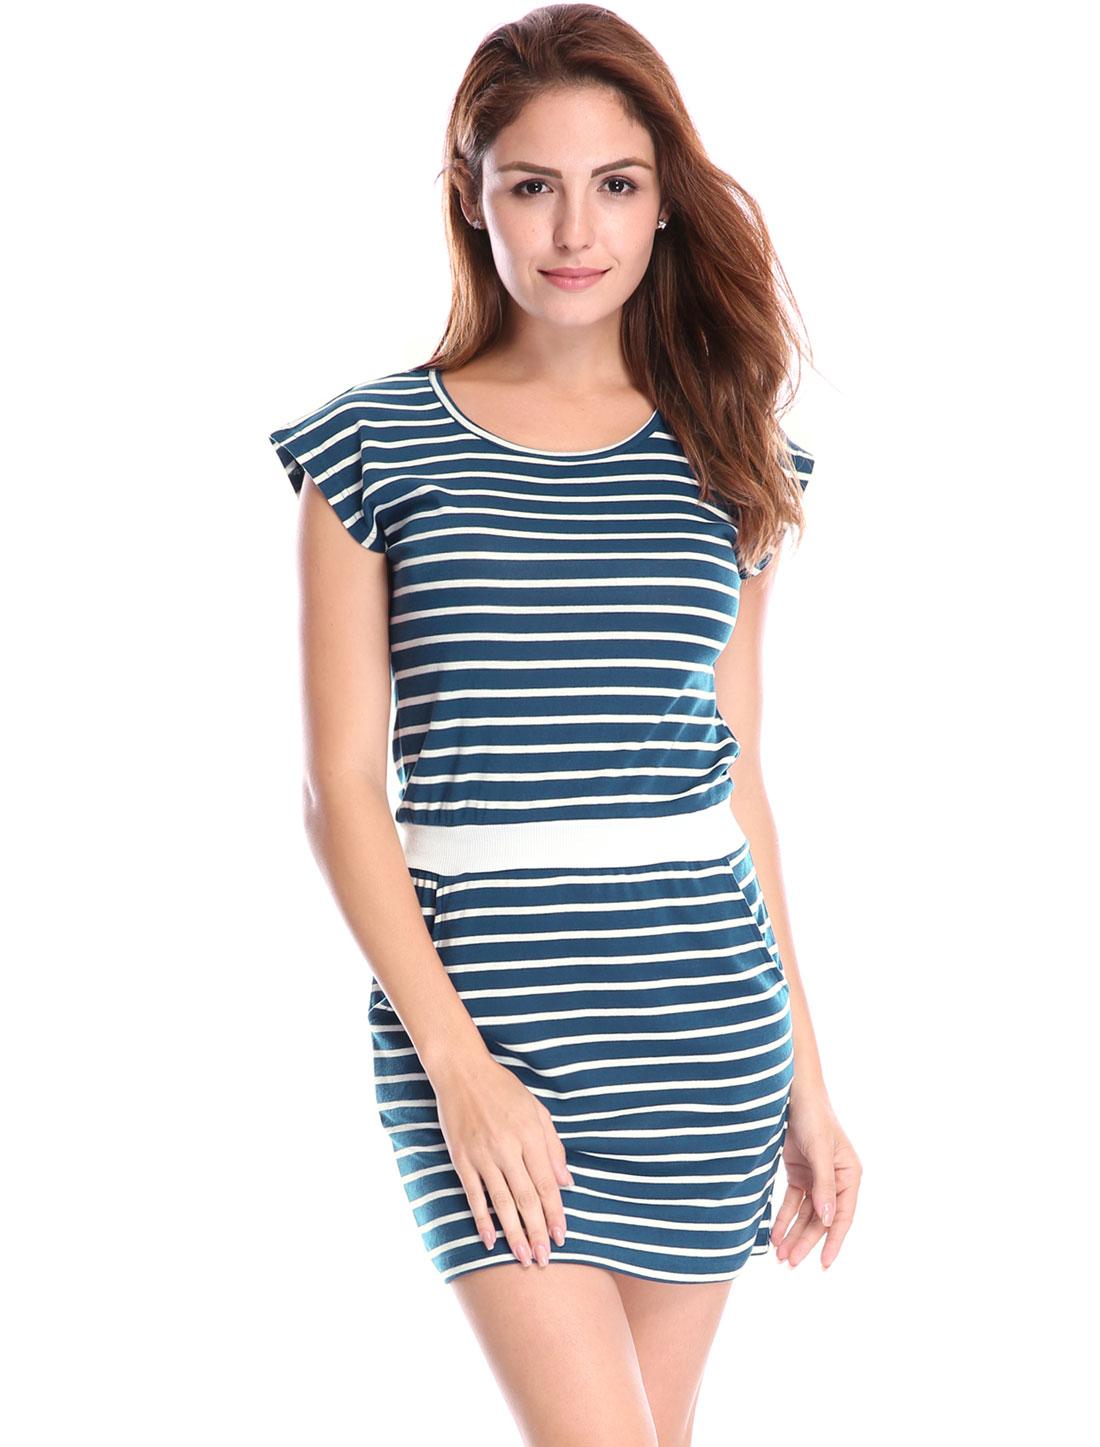 Women Stripes Paneled Round Neck Pockets Mini Dress Blue White S